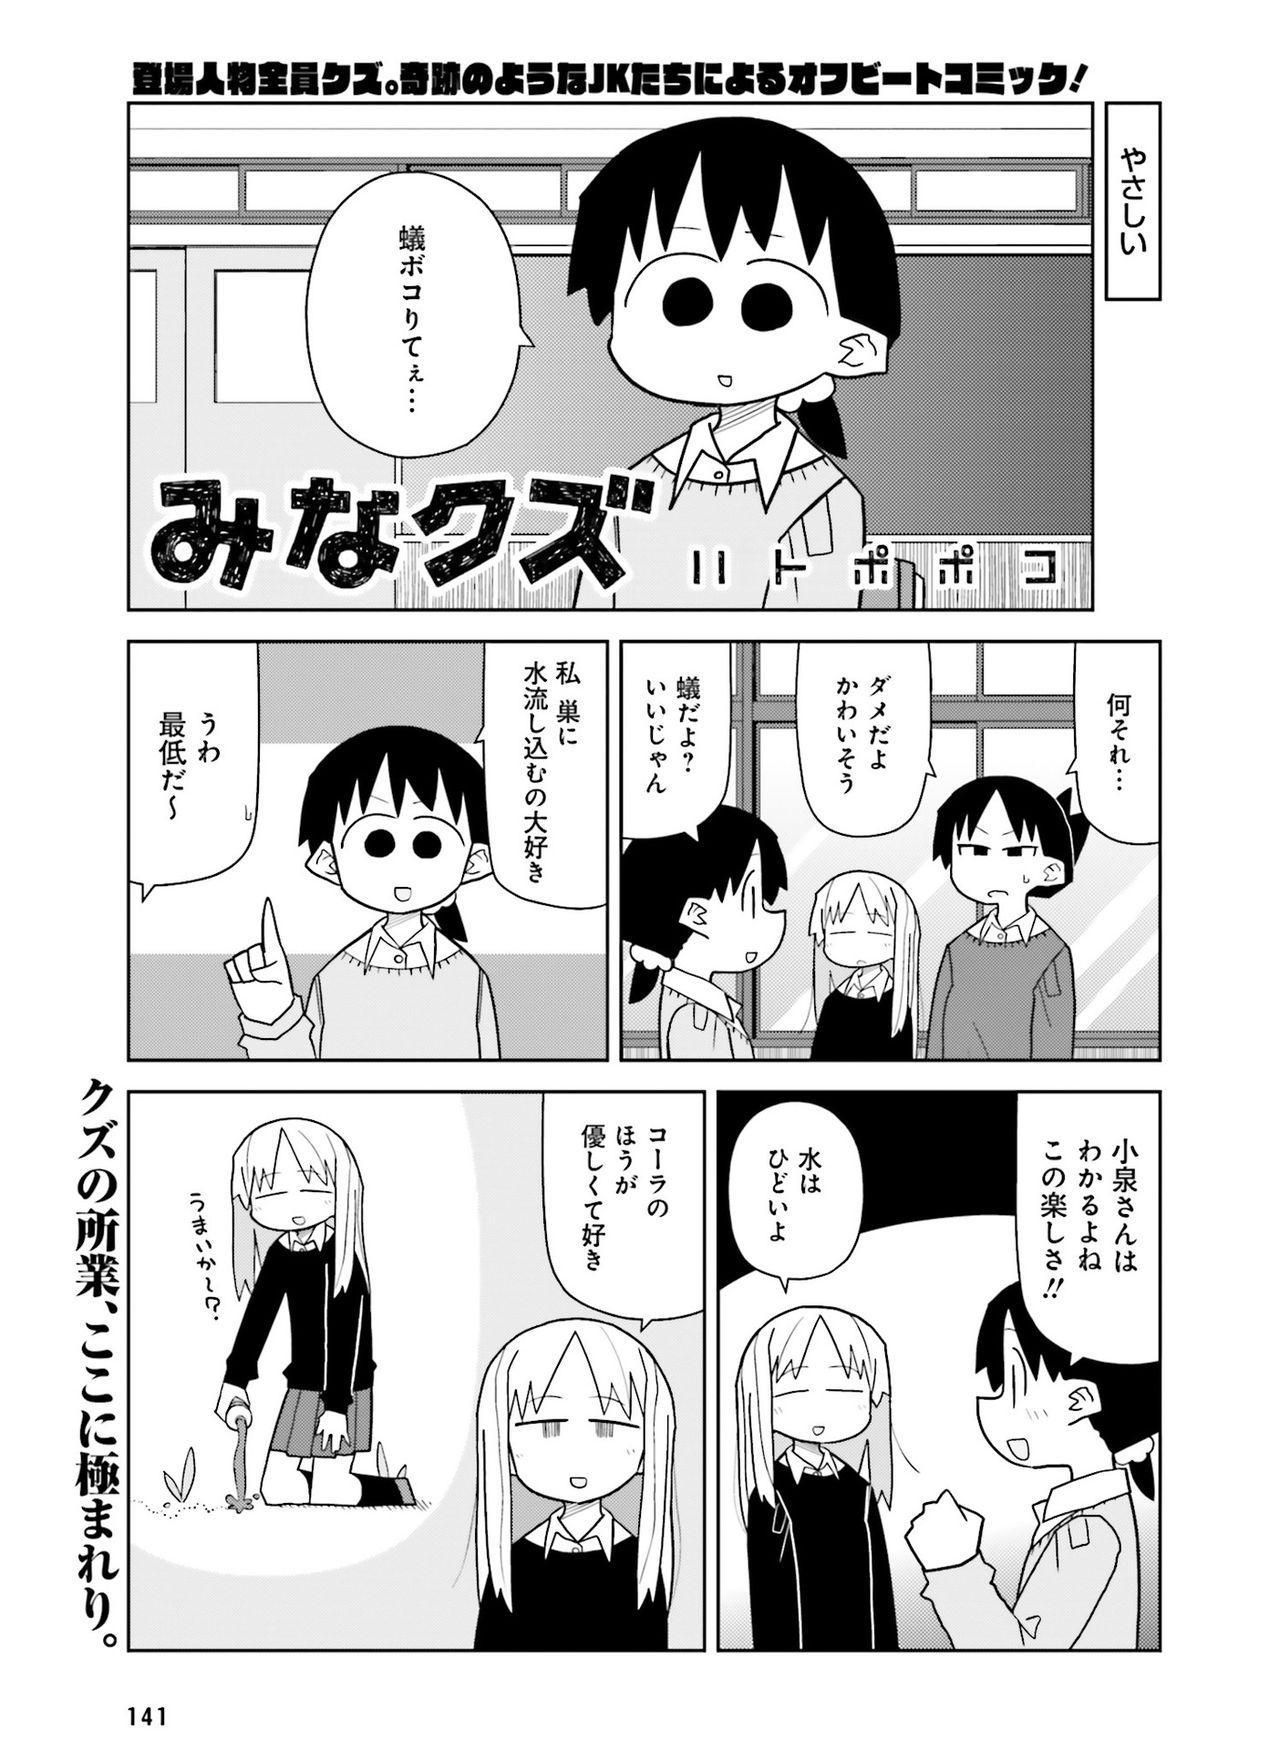 Dengeki Moeoh 2017-06 120